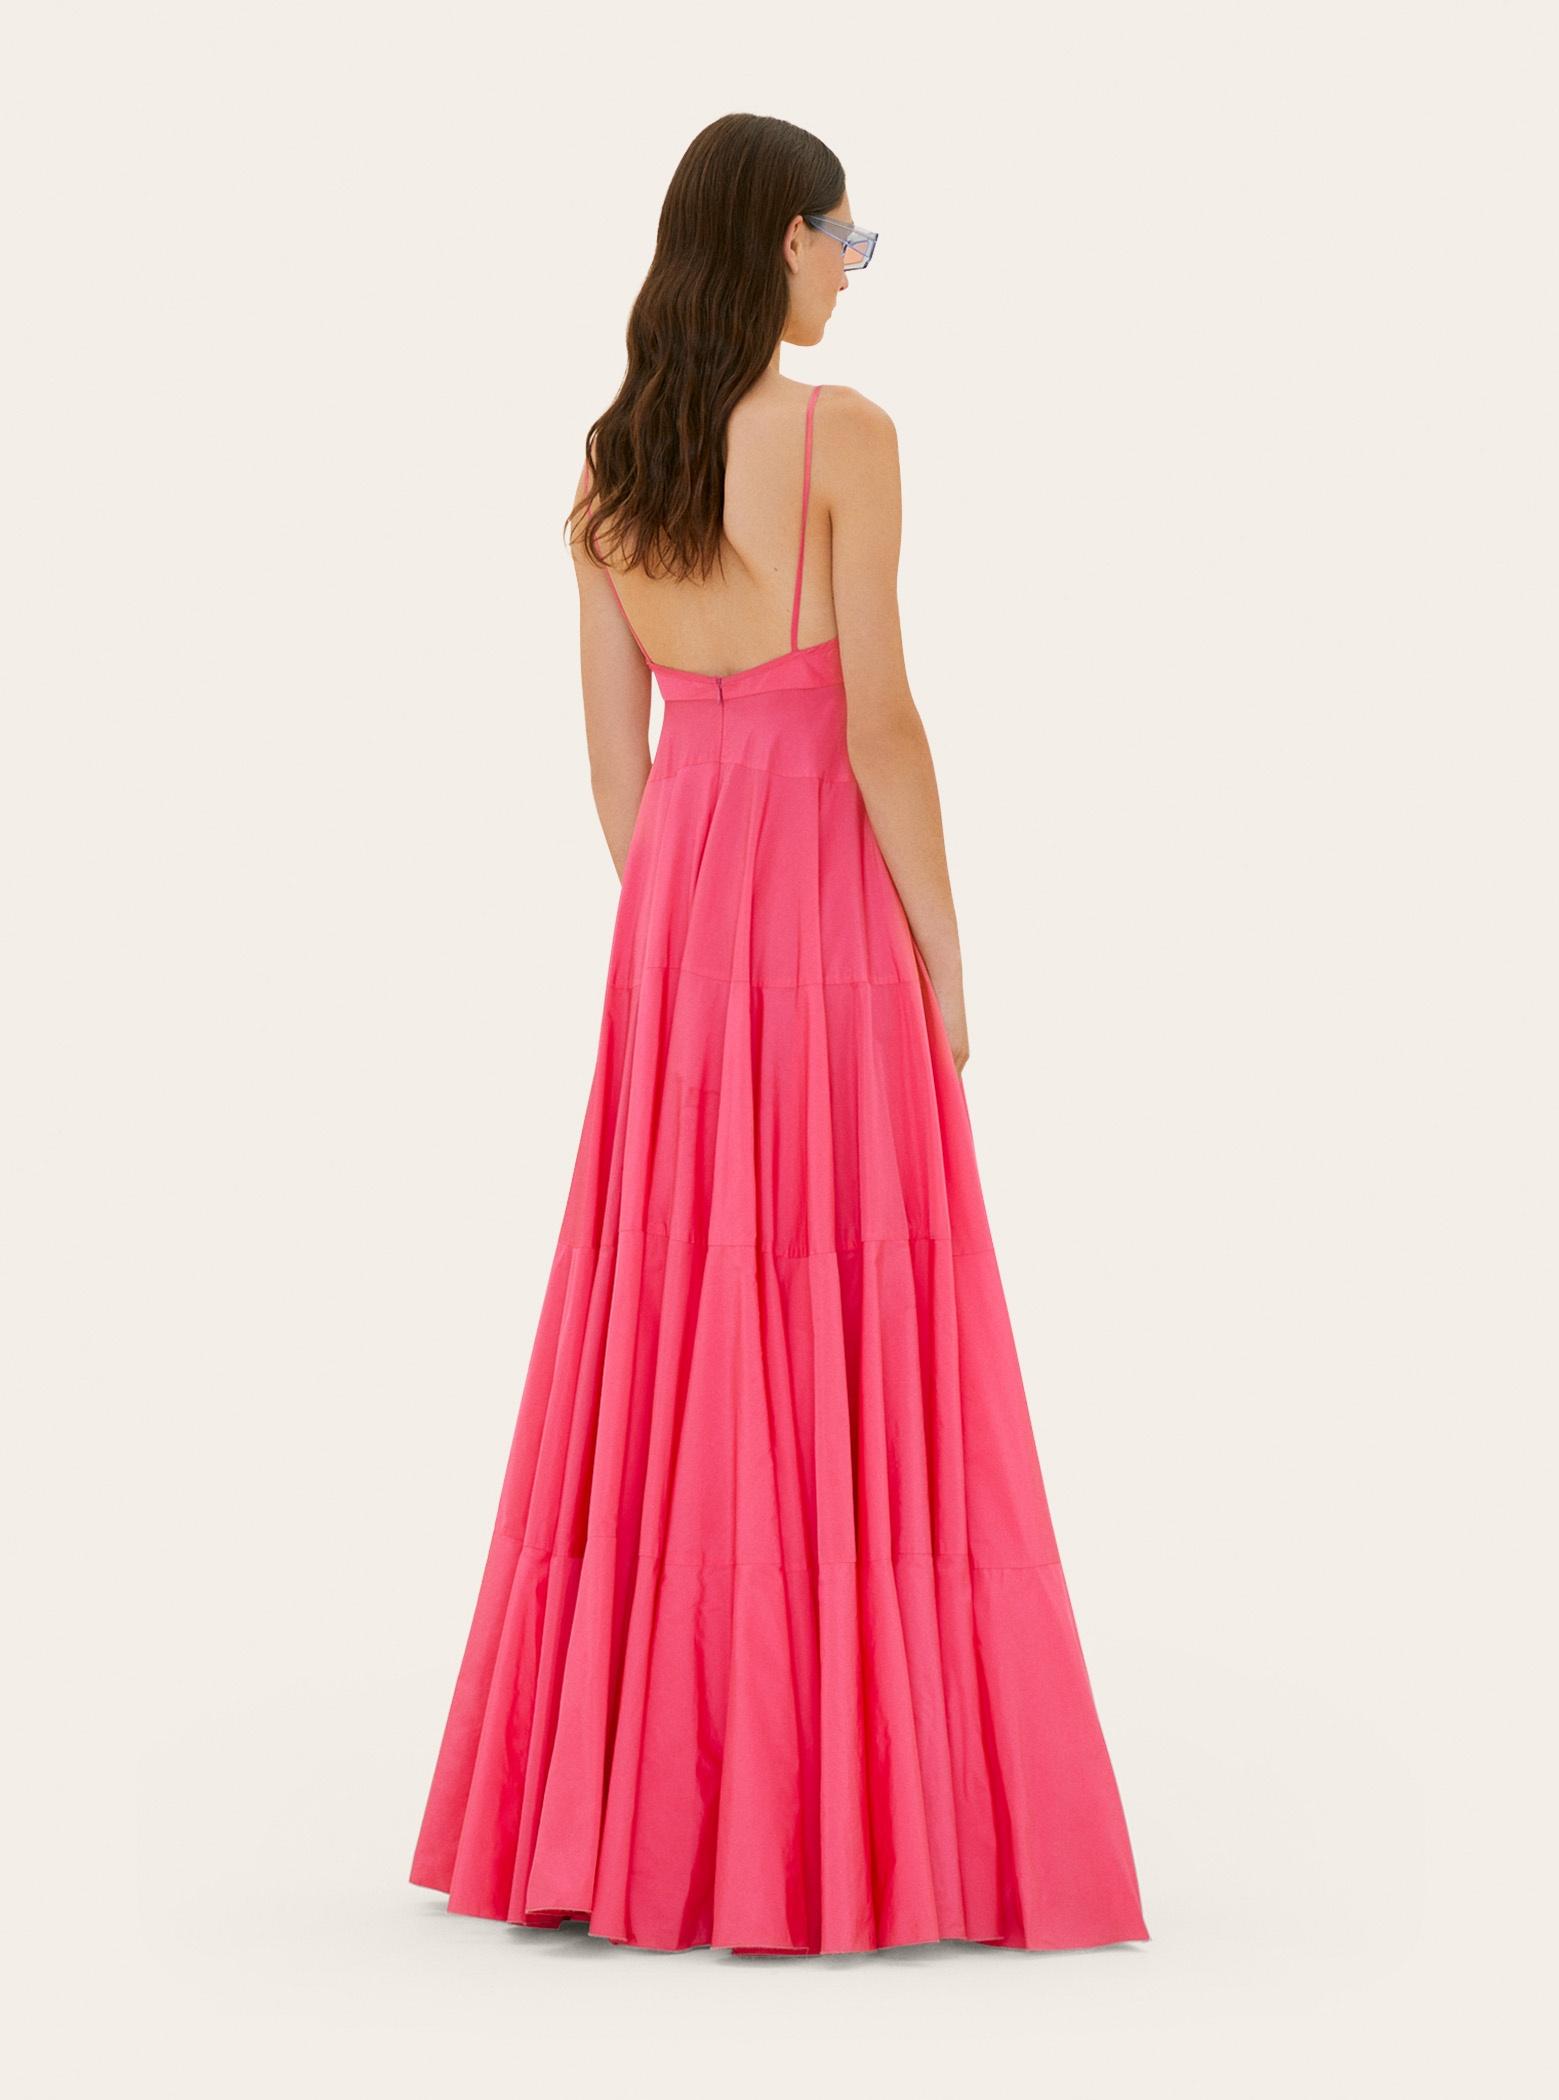 La robe Manosque